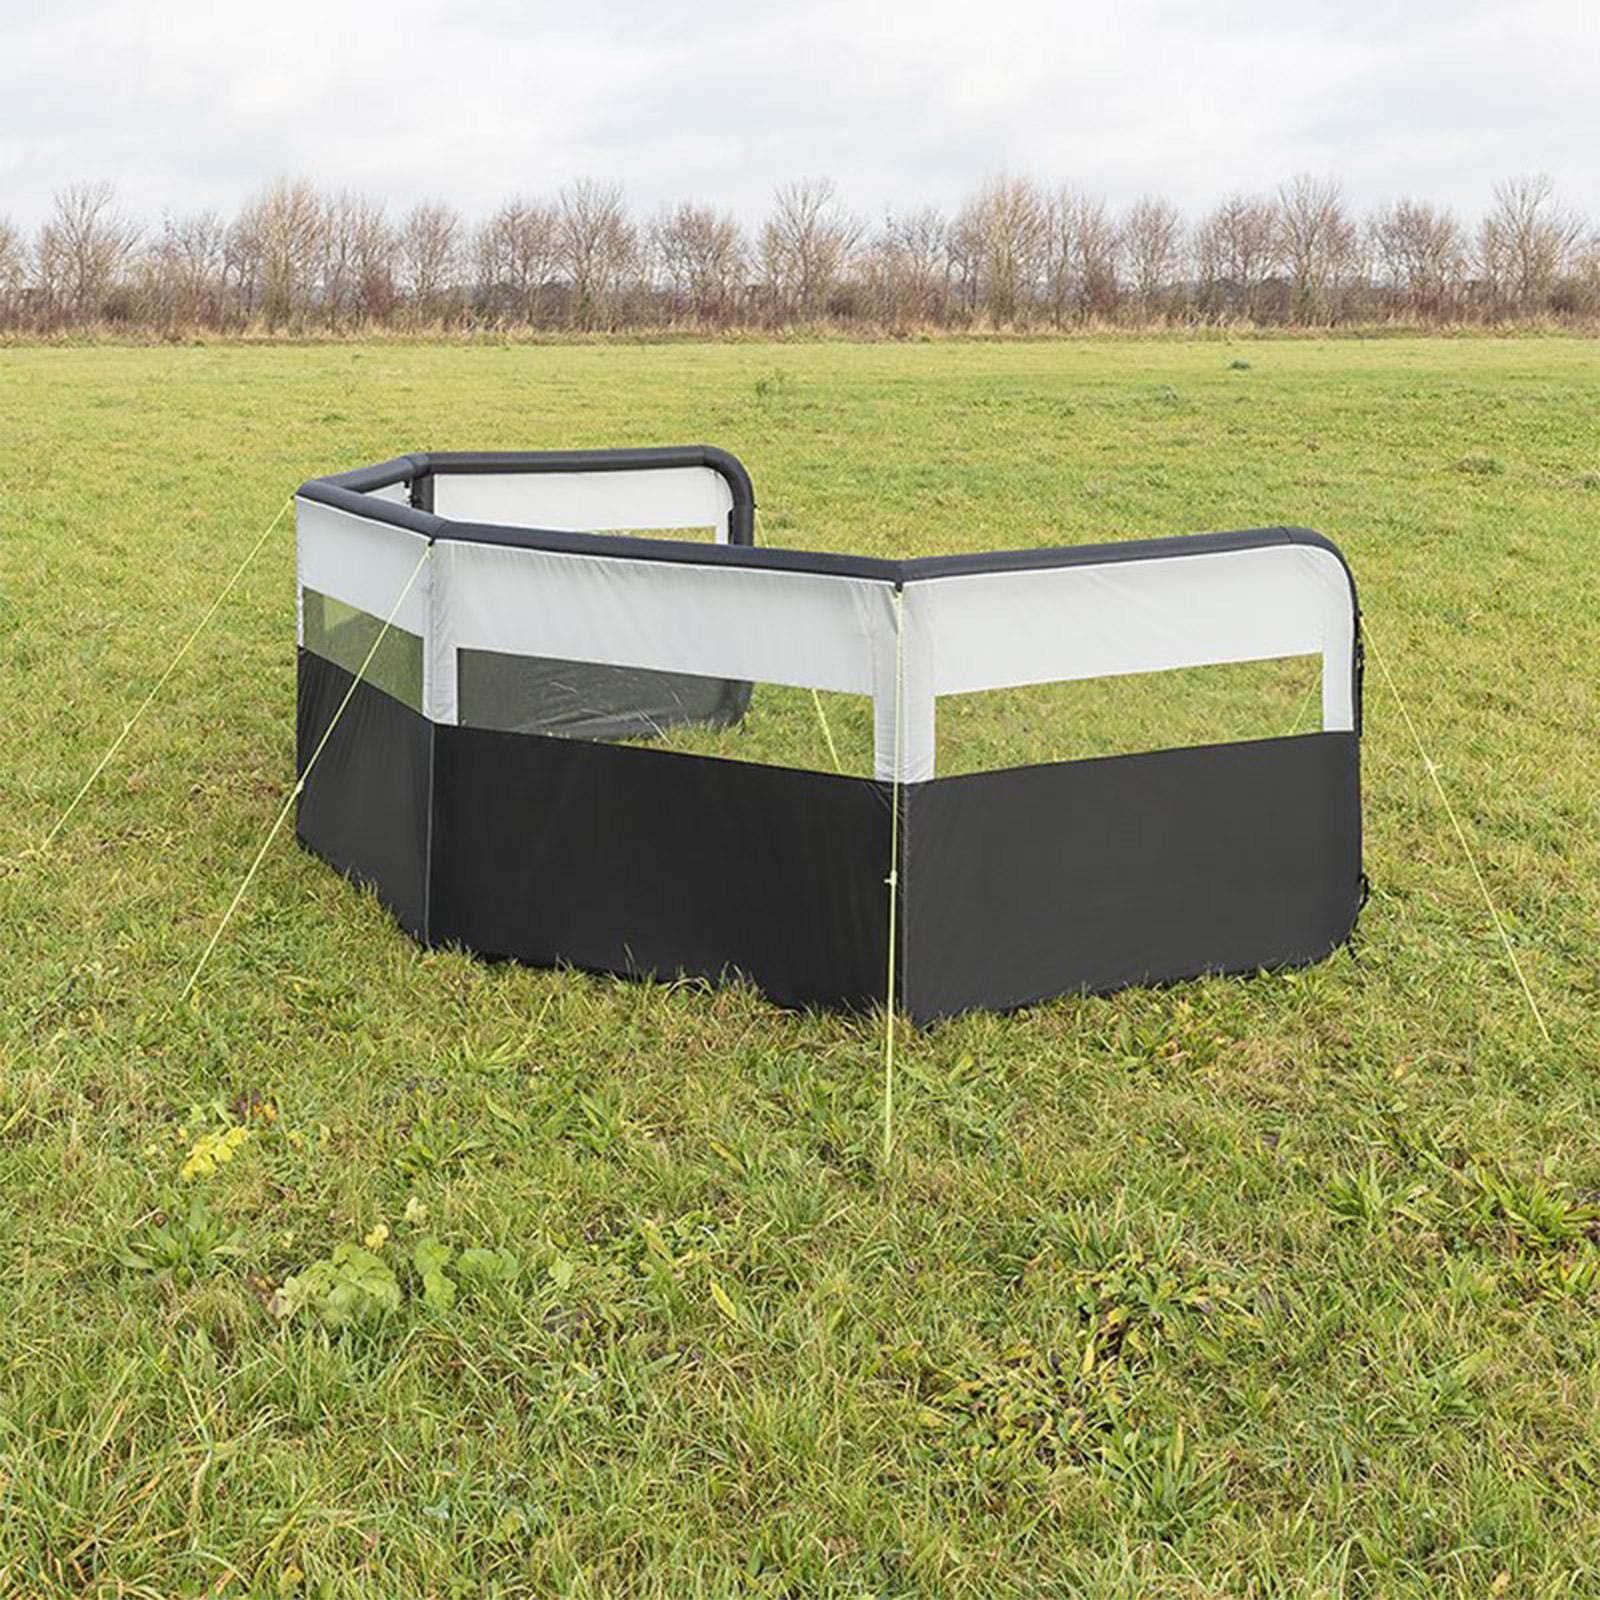 Windschutz Windbarikade aufblasbar | 150D Polyester | 840x140 cm | grau